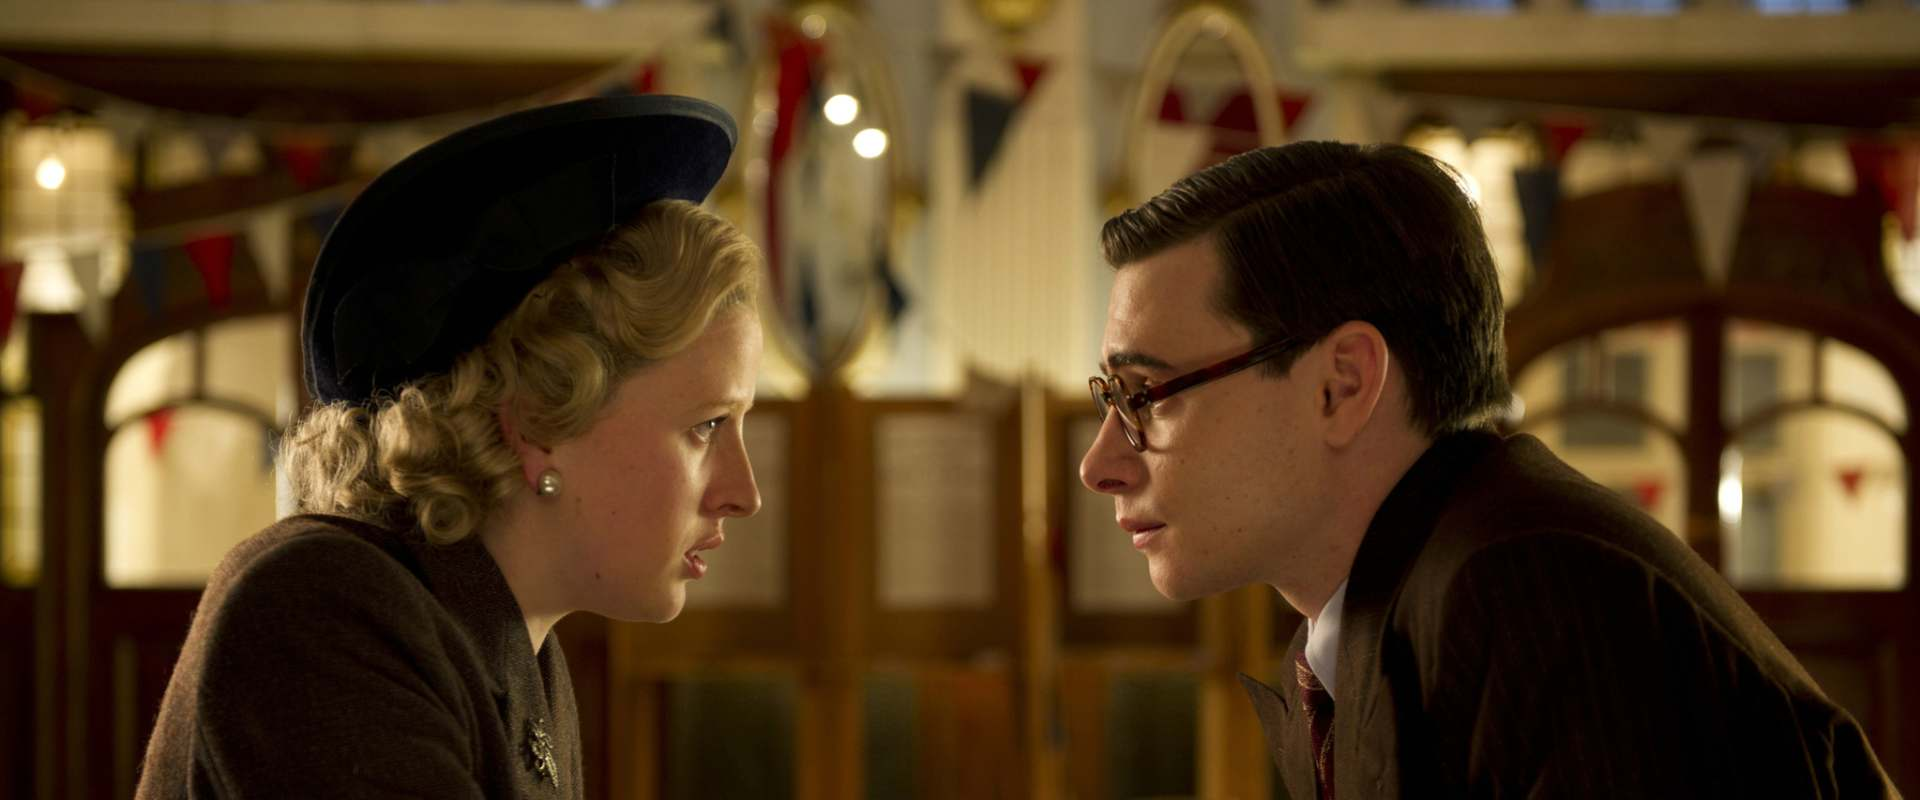 Leaving Netflix, The Iron Lady on July 5